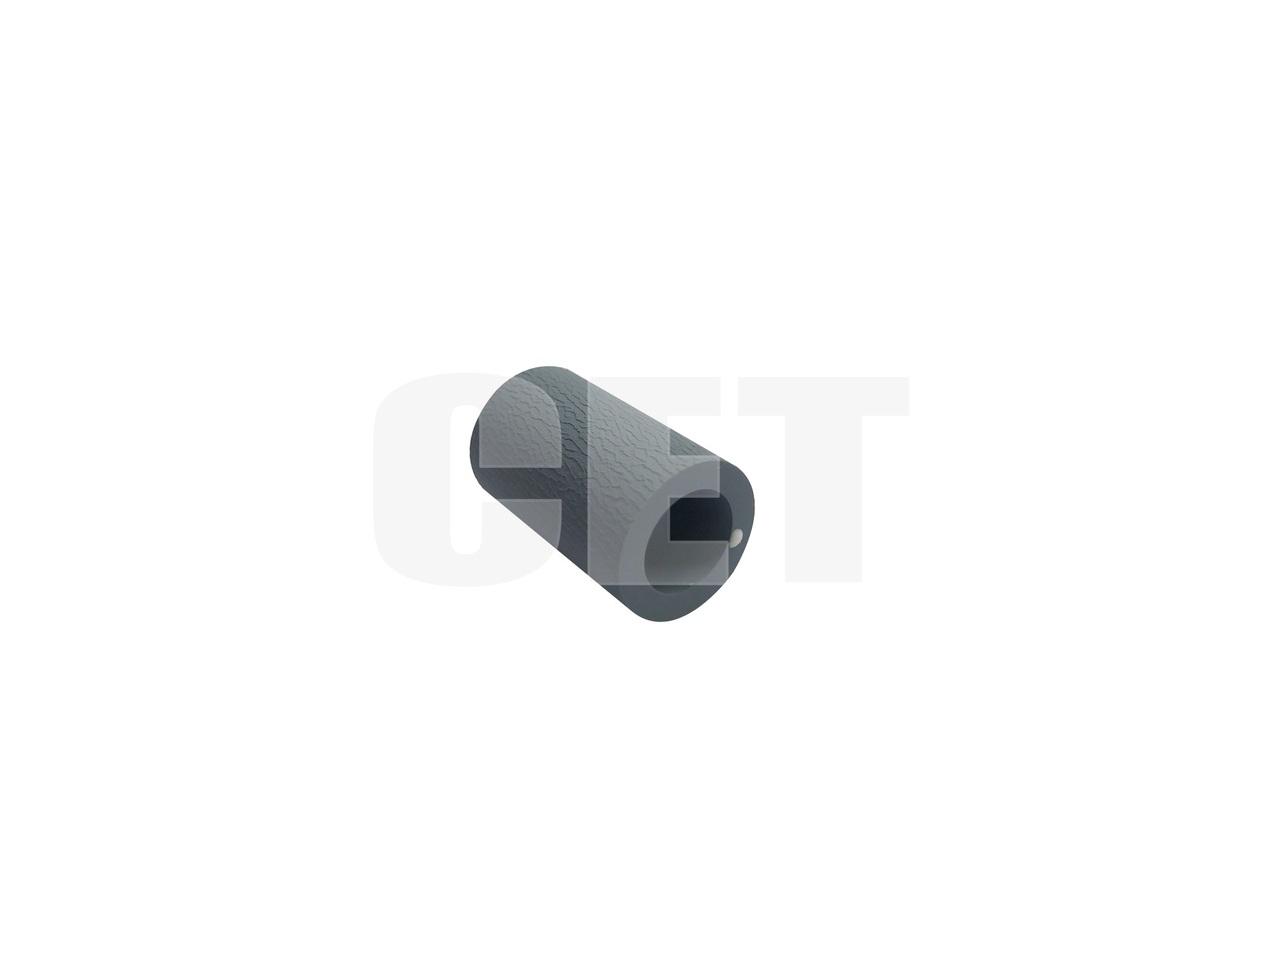 Резинка роликов подхвата/подачи 2-го лотка RM2-5452-000 для HP LaserJet Pro M402dn/M403/MFP M426 (CET),CET3114PT